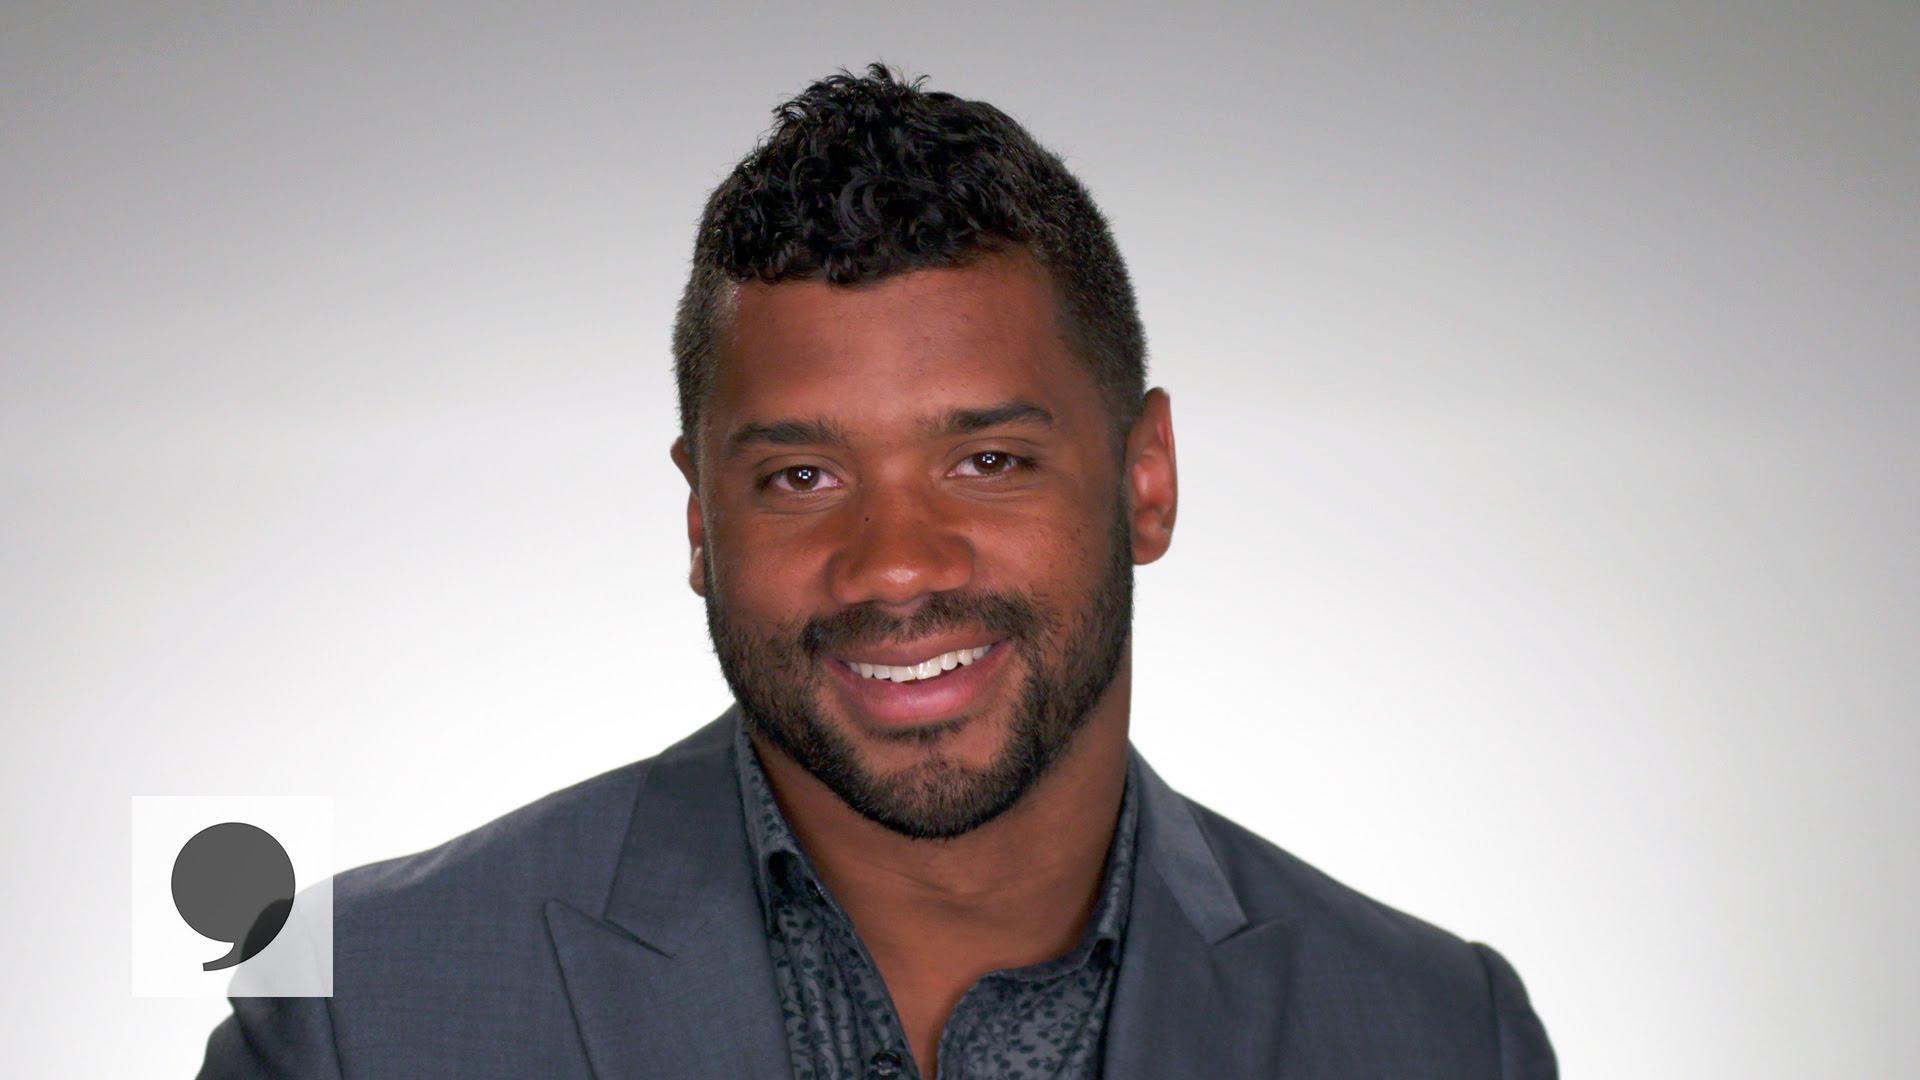 Footballer Russell Wilson - age: 32